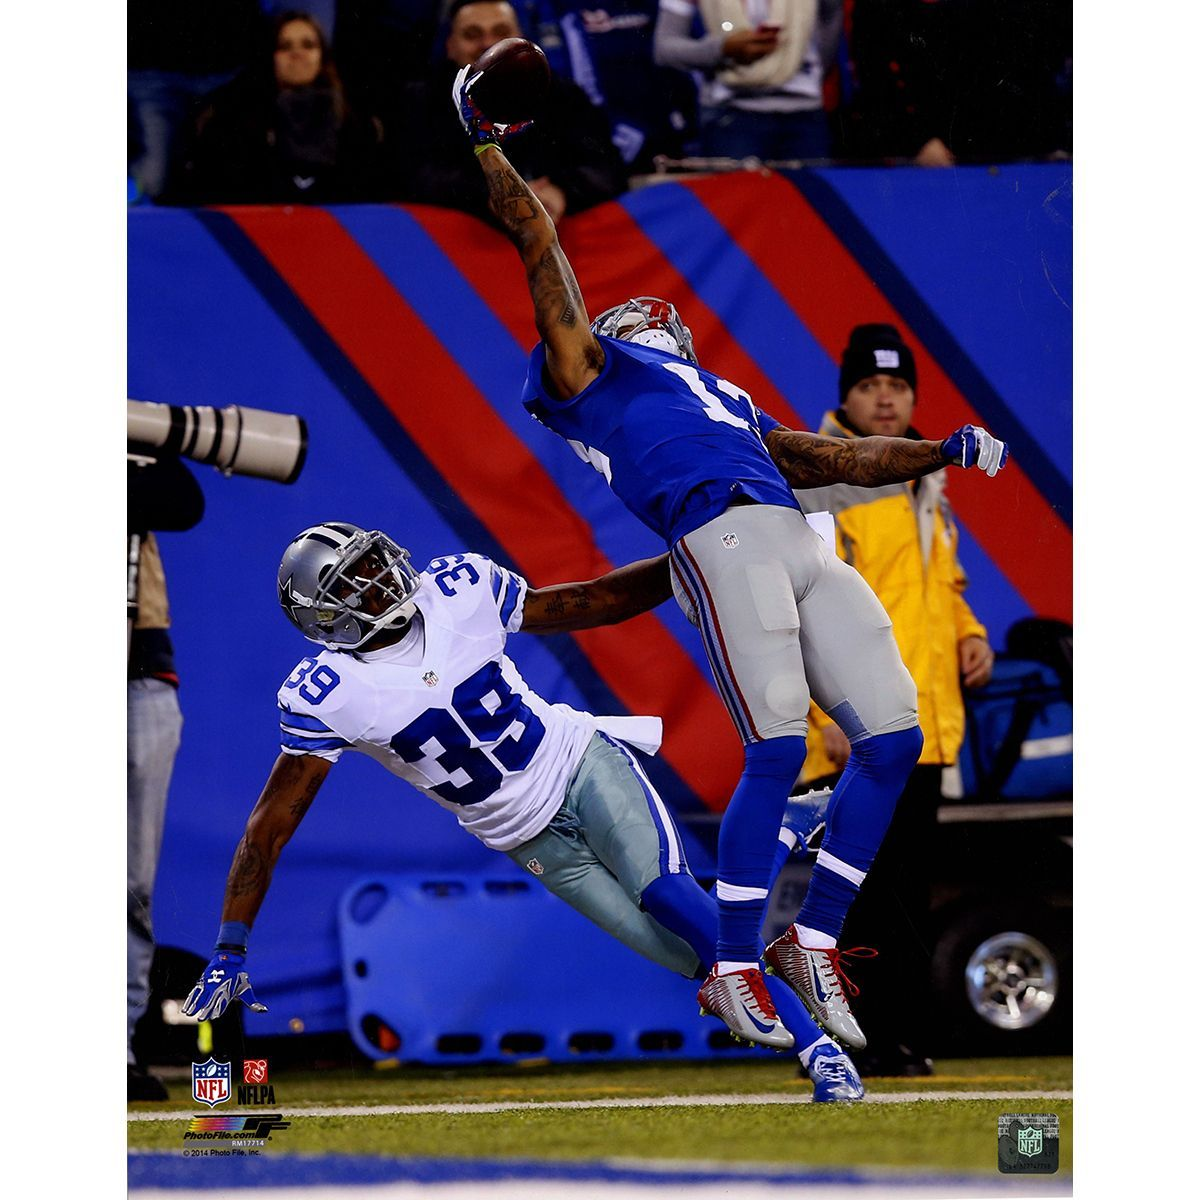 wholesale dealer 0a5bd 3890d Odell Beckham Jr. One-Handed Catch Vertical 16x20 Photo ...